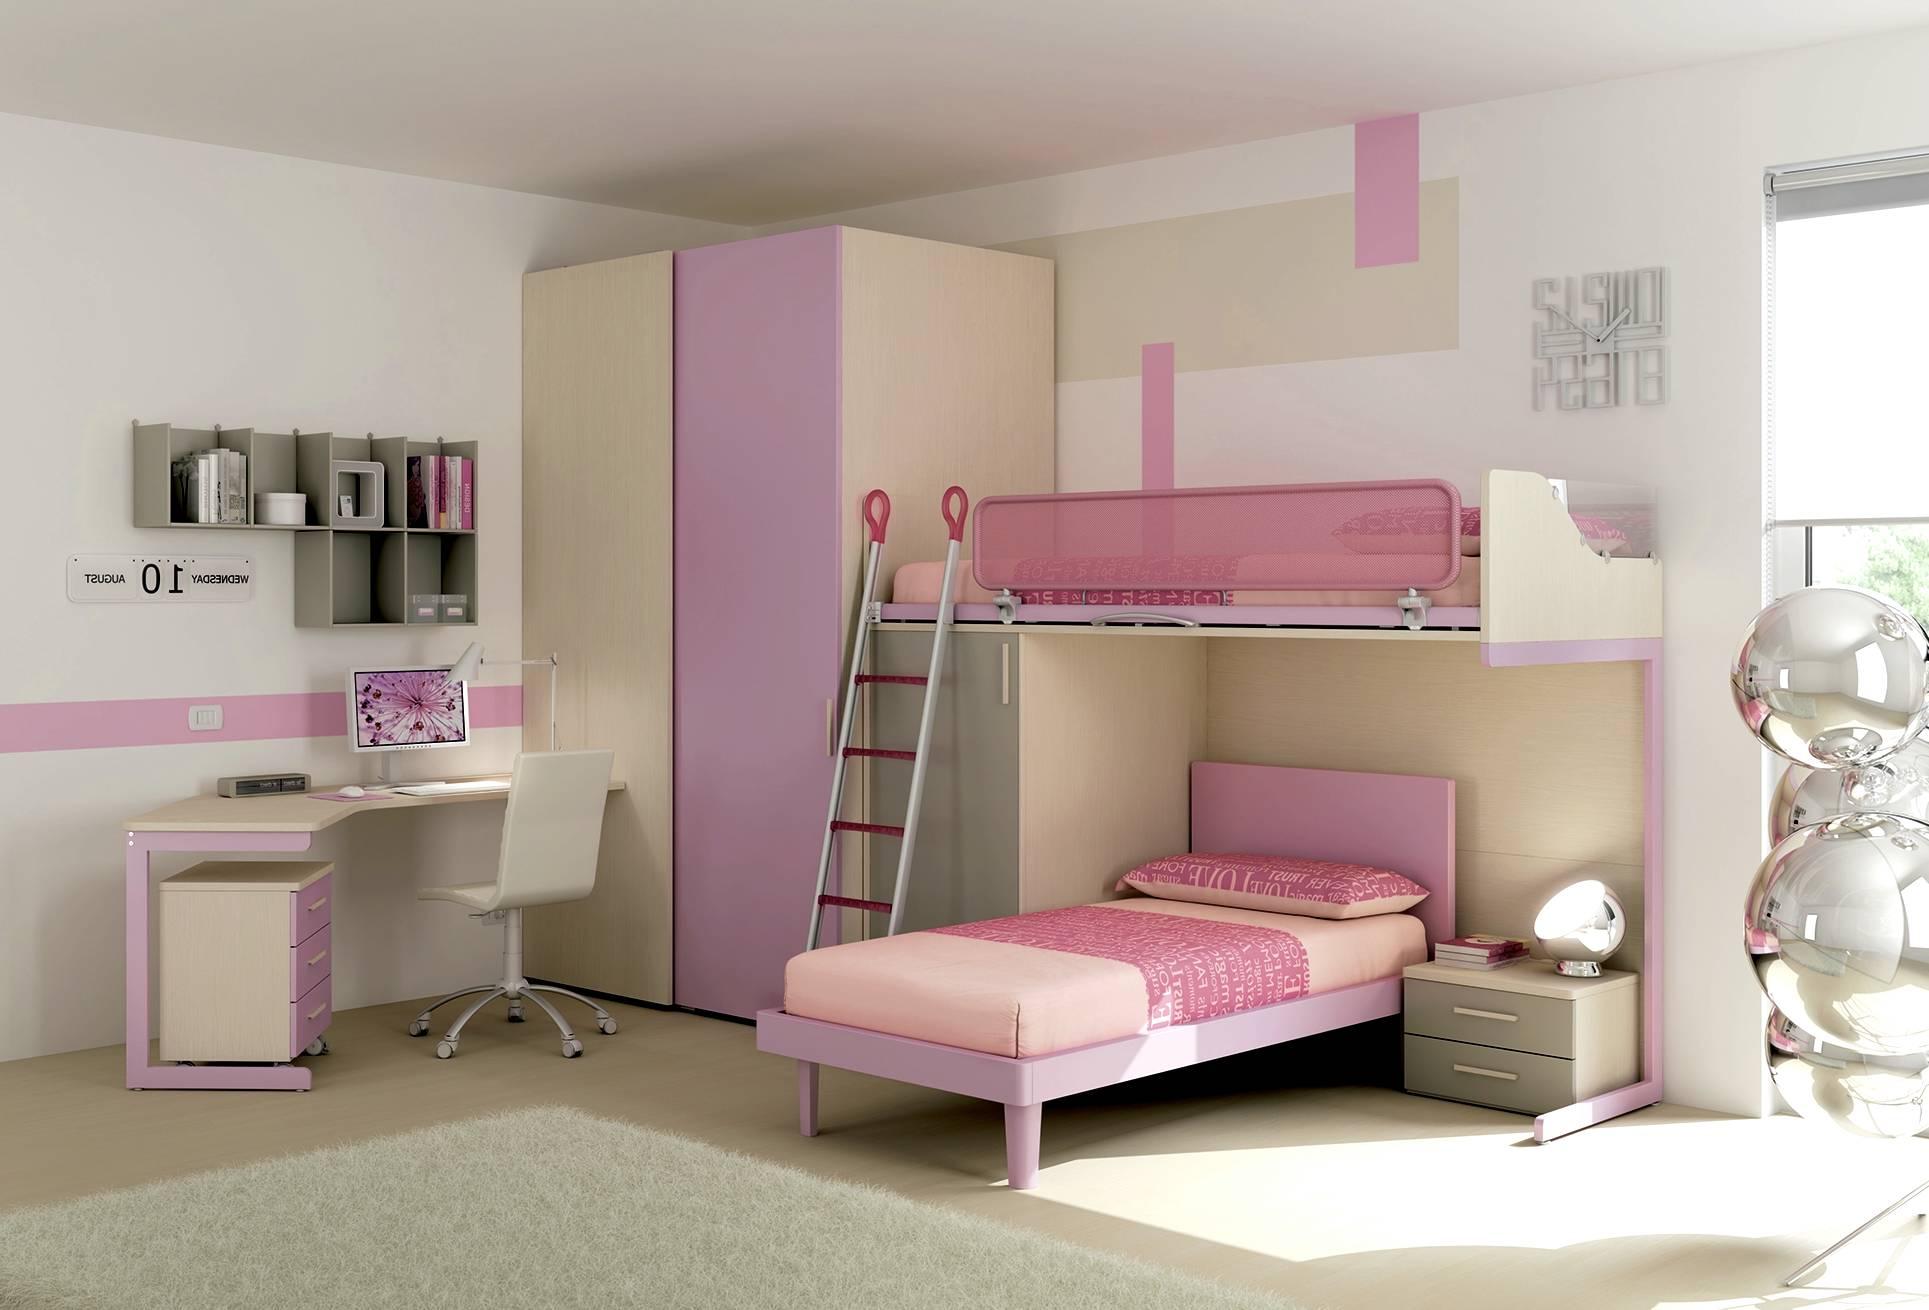 Chambre Enfant Pastel   Kids Room Decor Pastel Kid 39s Room Chambre ...